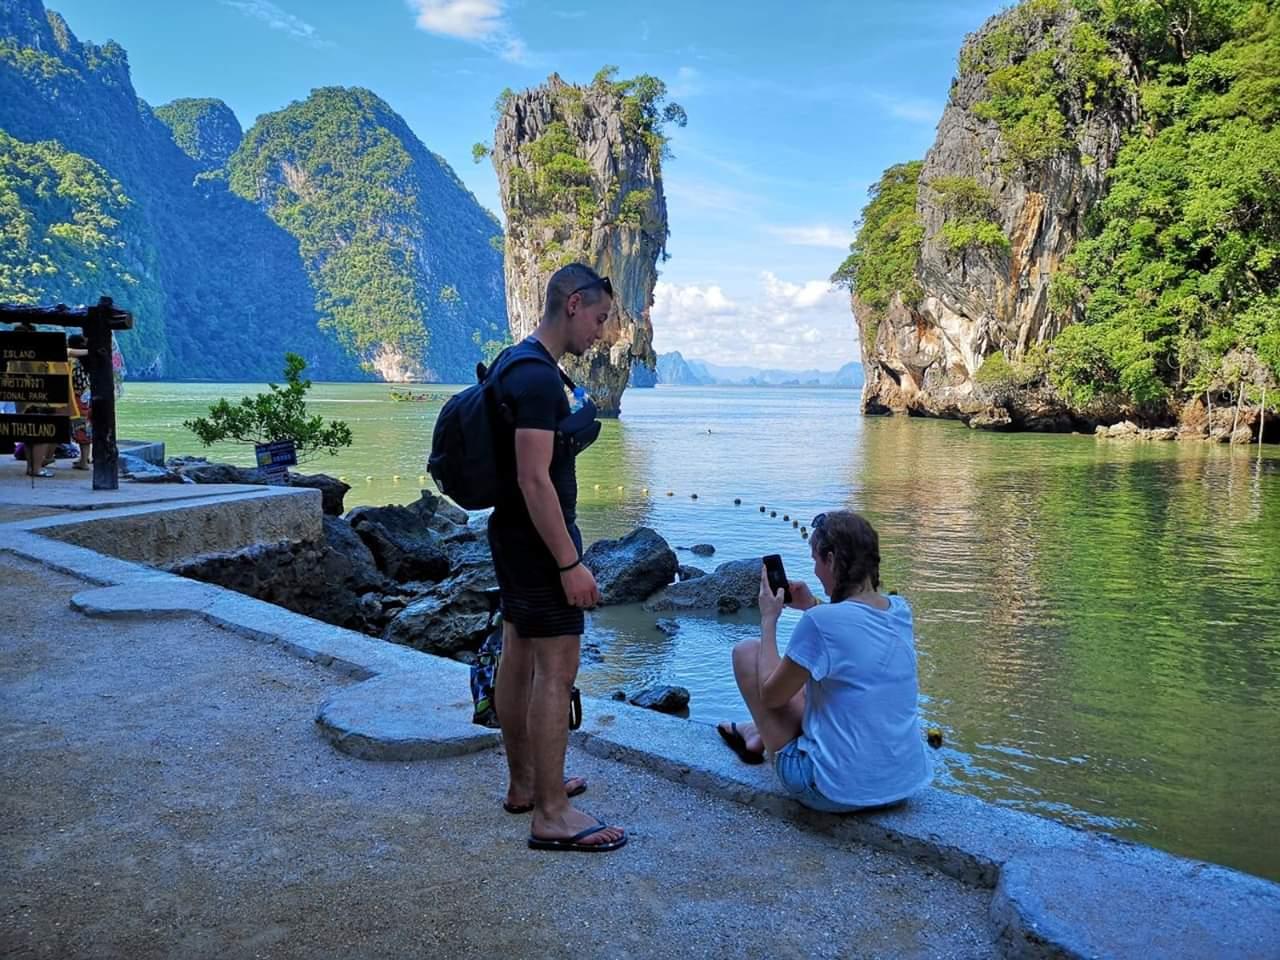 James Bond/ Bahía de Phang Nga Bay en Speedboat